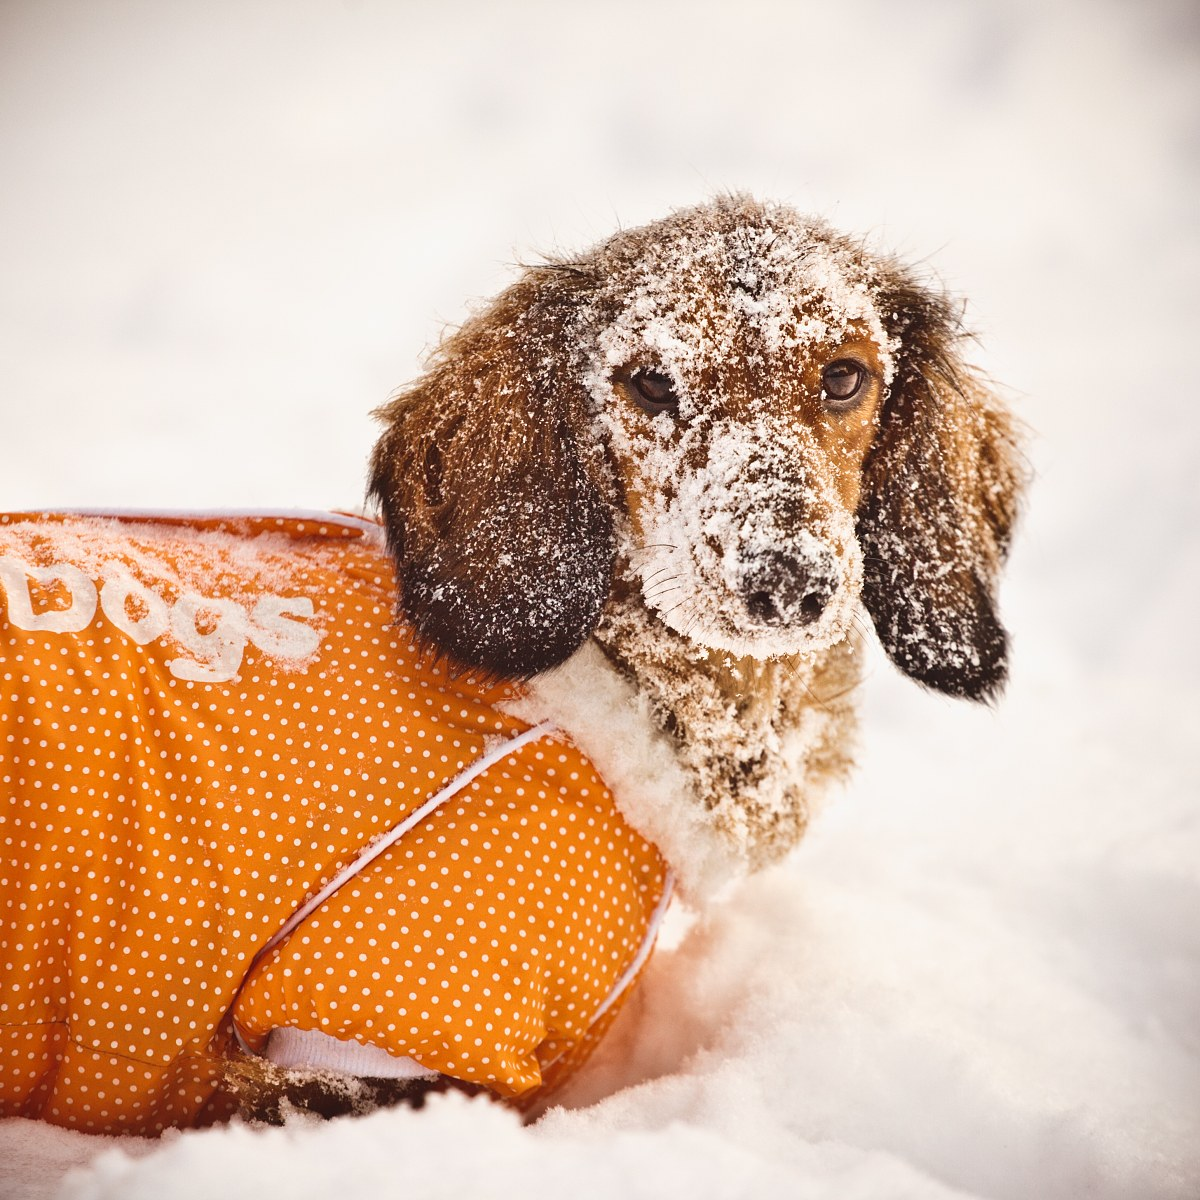 Dessi the dachshund in snow